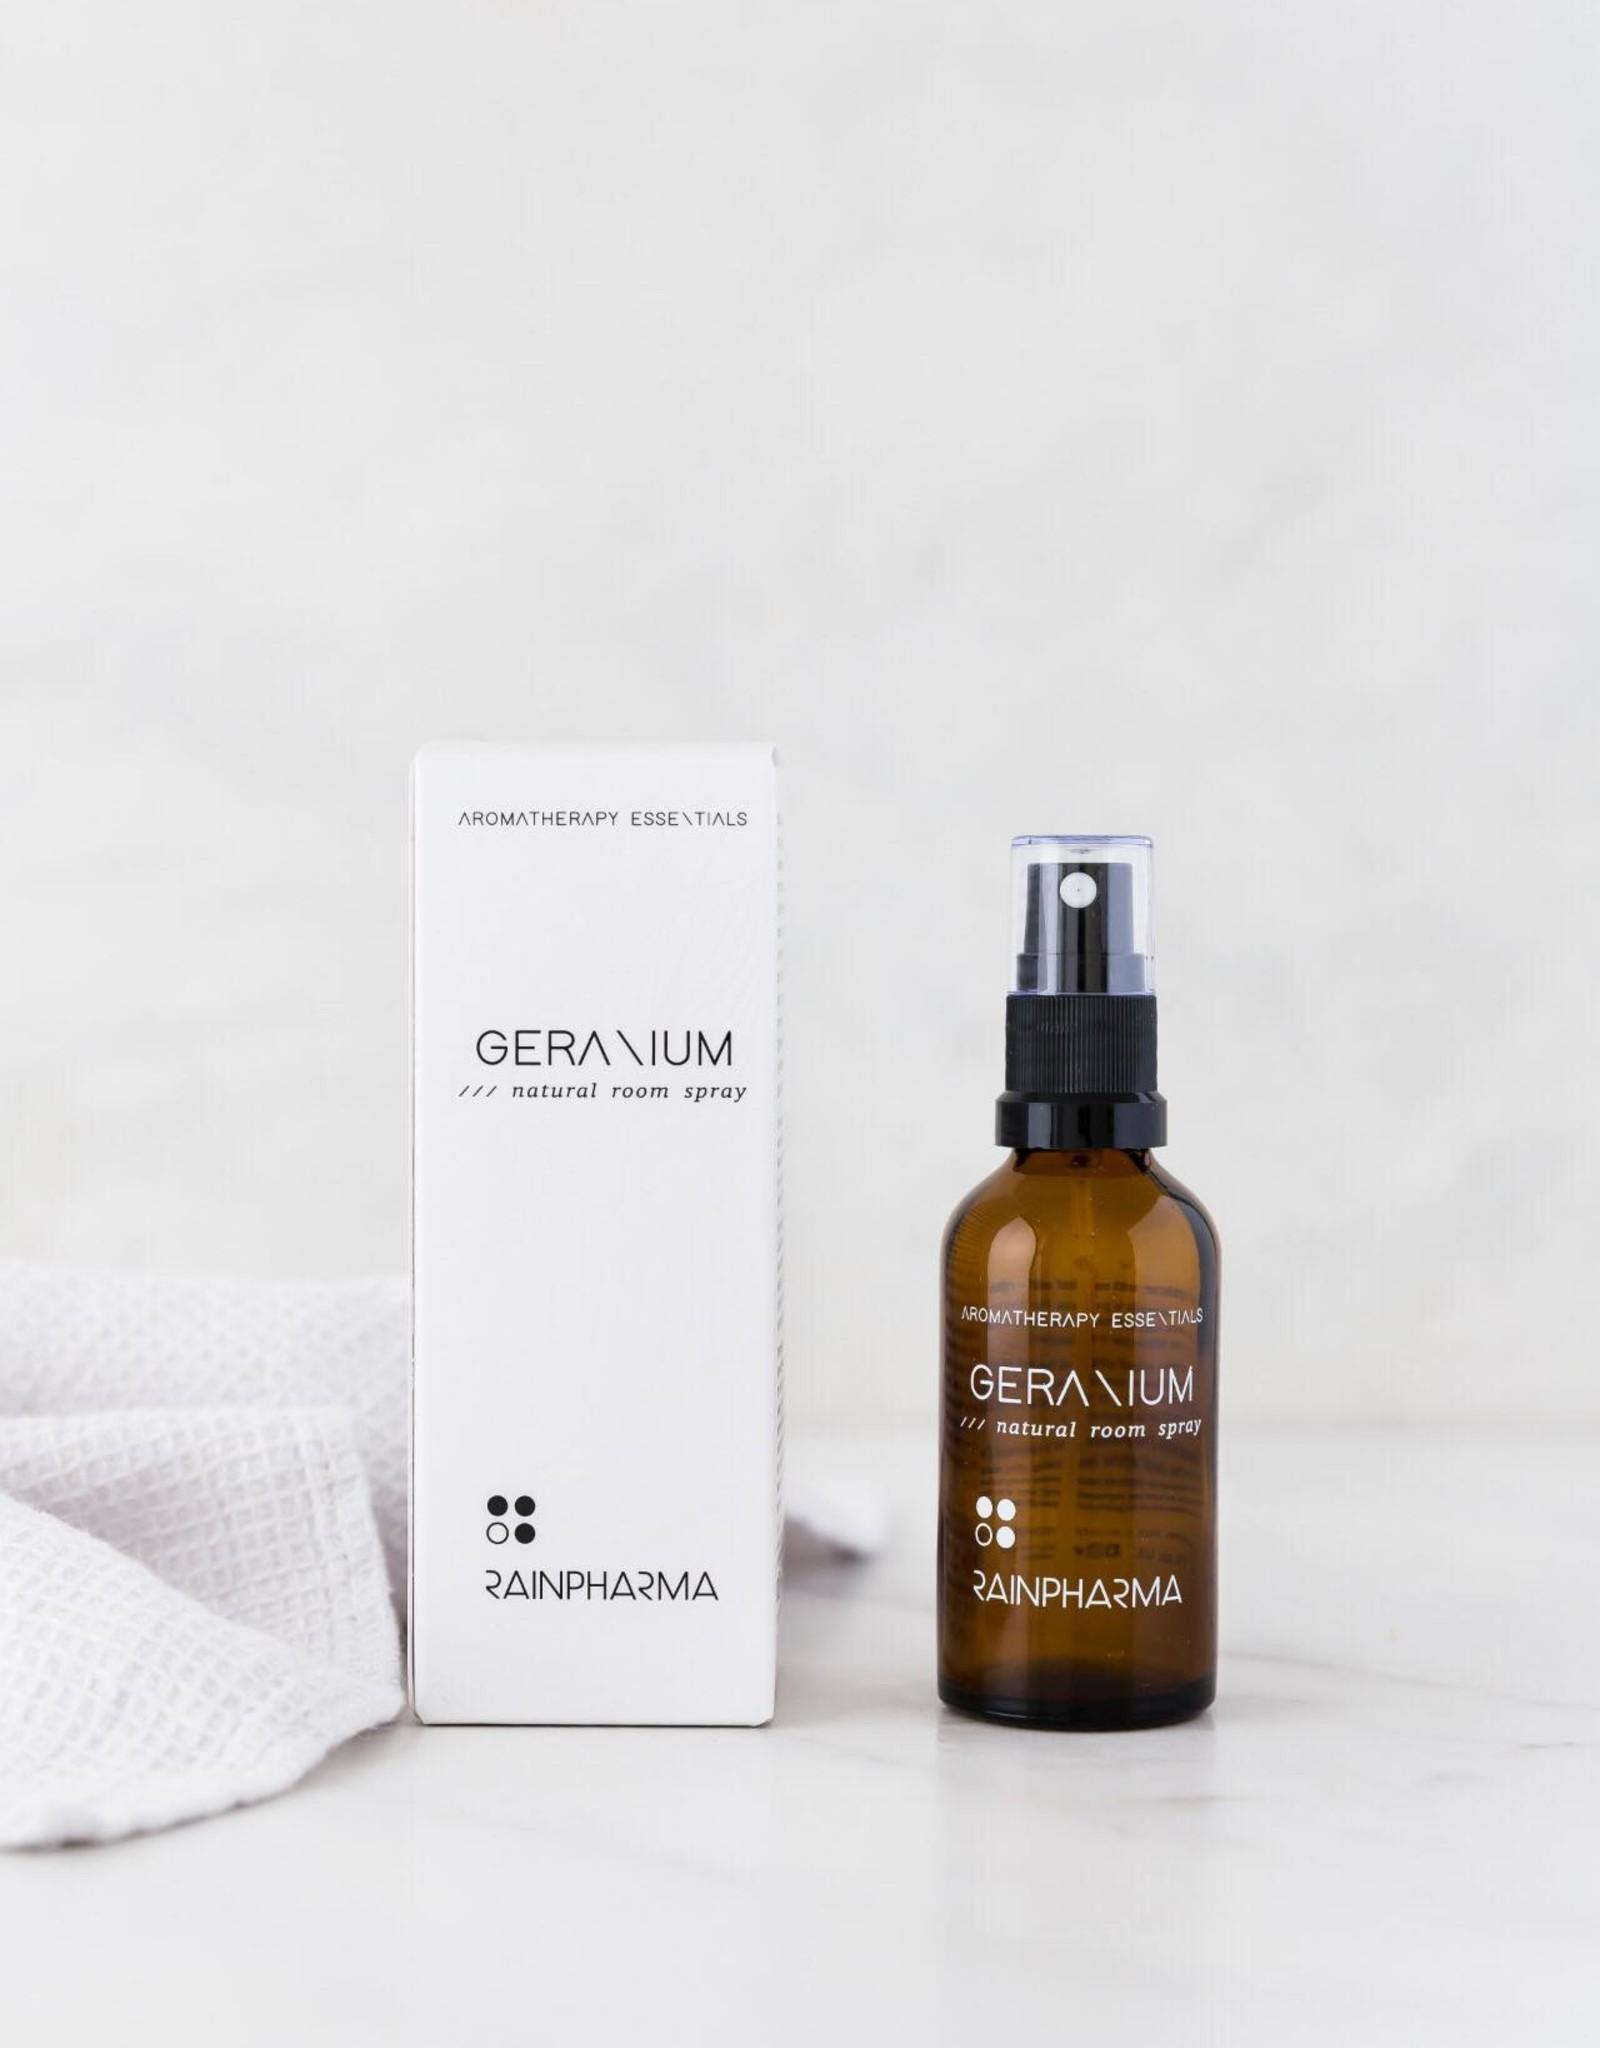 RainPharma Natural Room Spray Geranium 50ml - Rainpharma